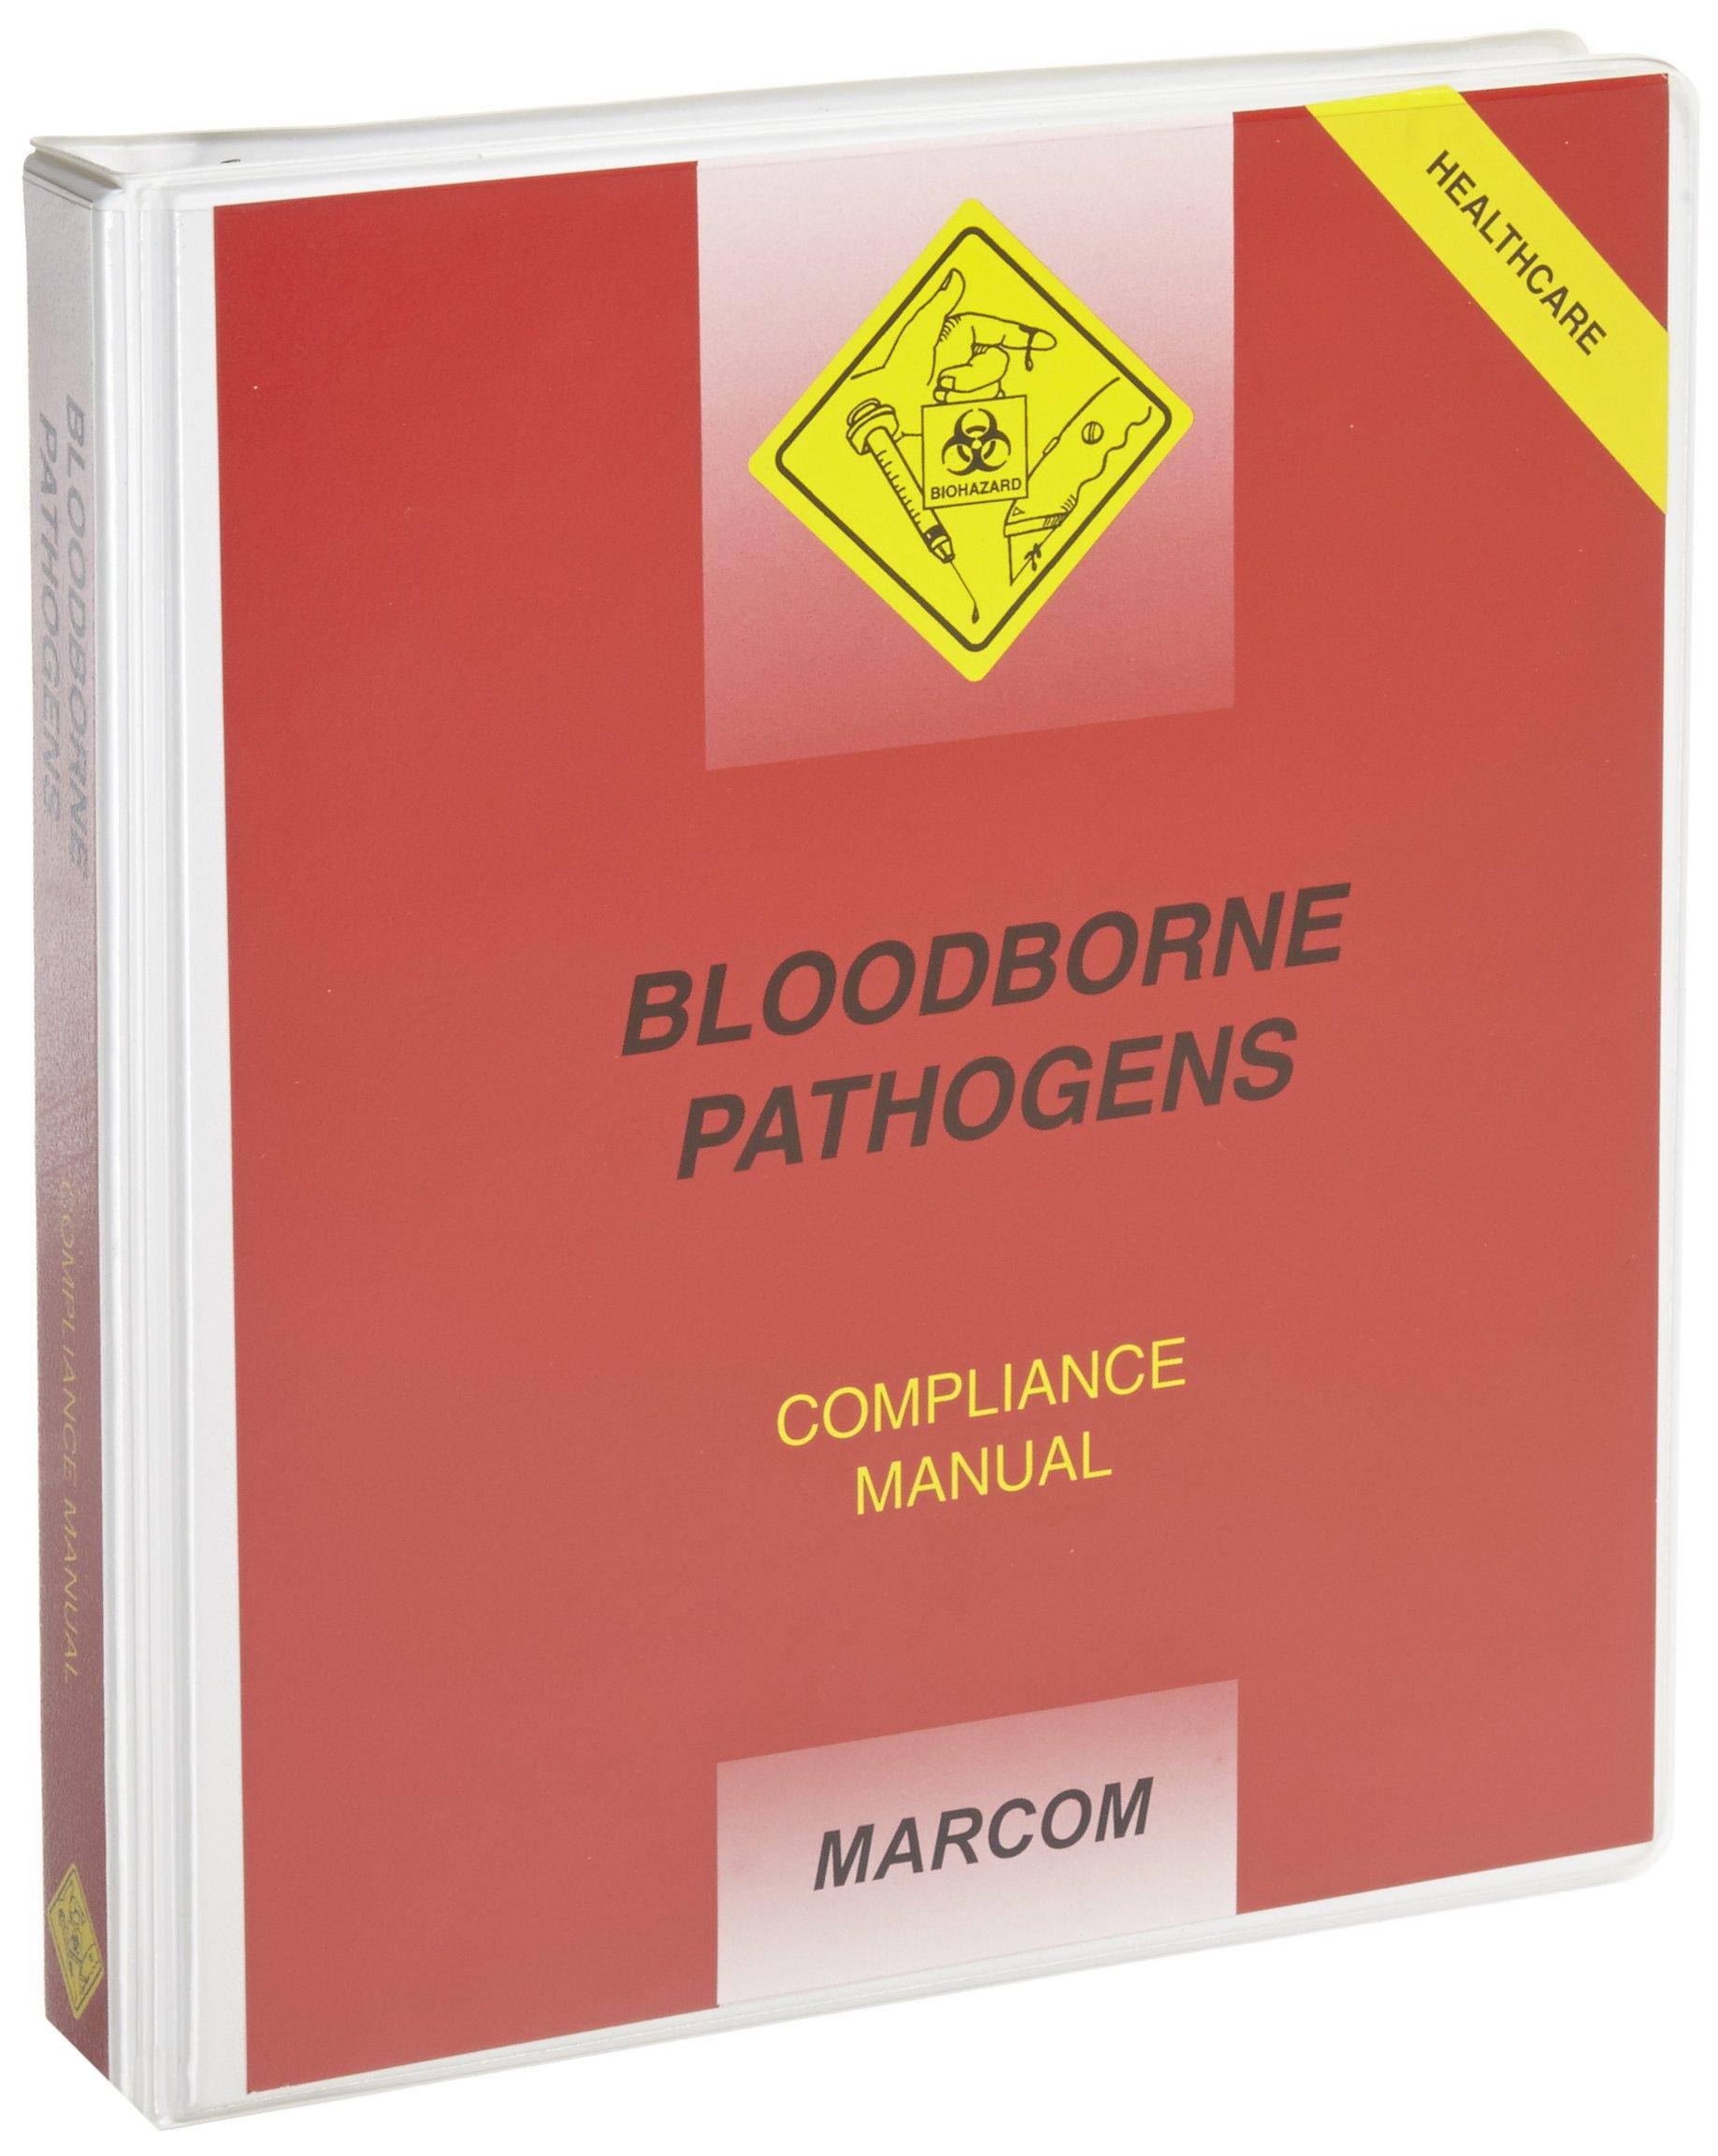 MARCOM Bloodborne Pathogens in Healthcare Facilities Compliance Manual